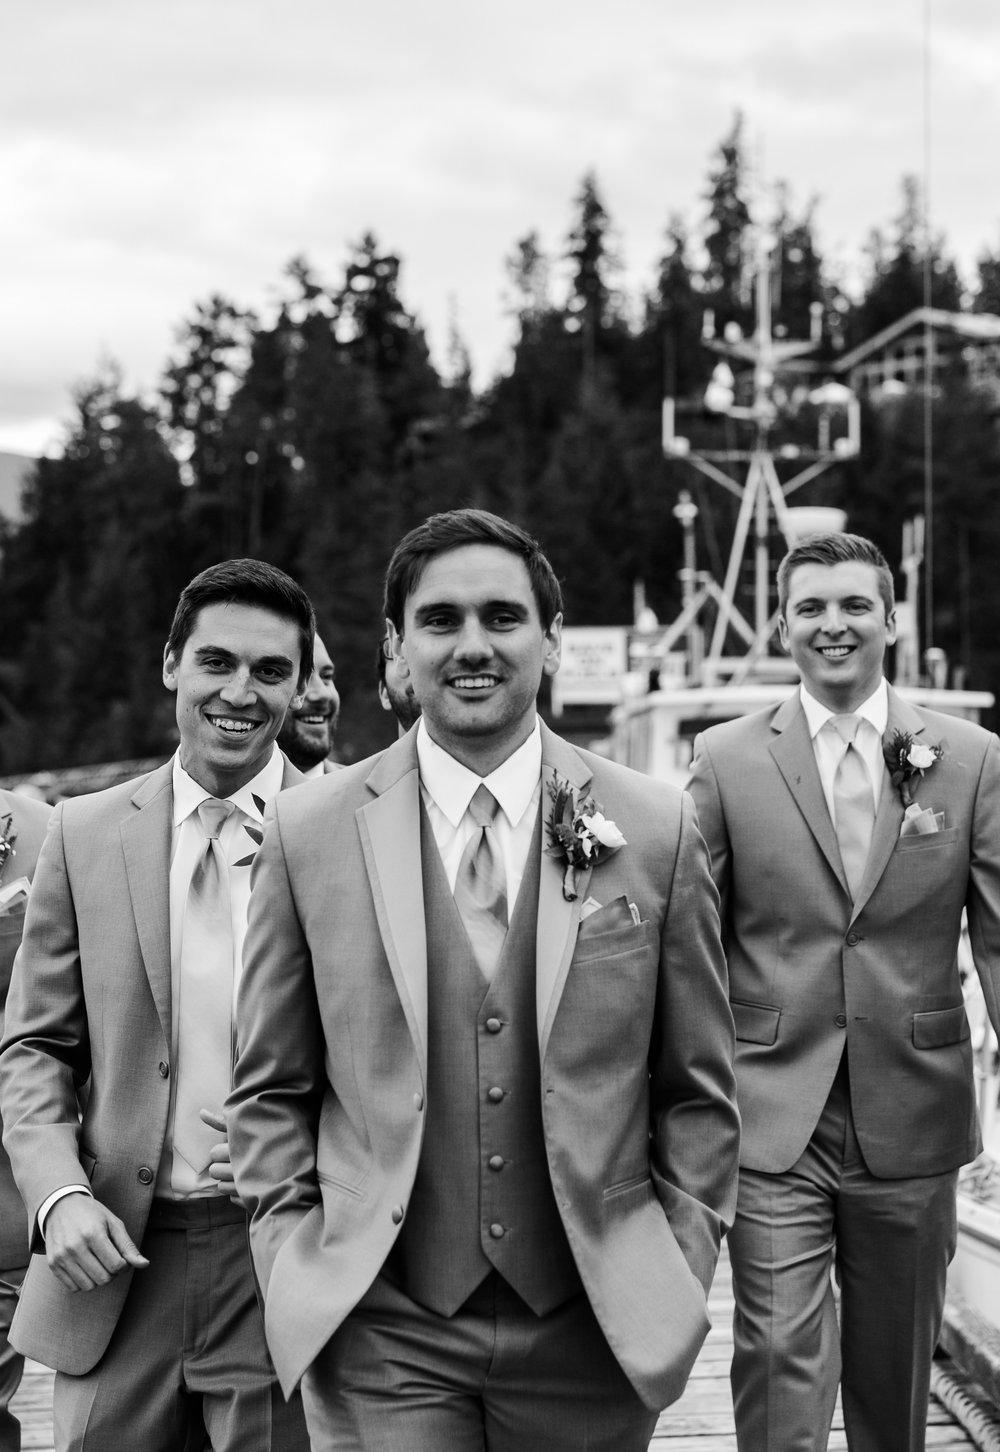 West Coast Wilderness Lodge Wedding Photos - Vancouver Wedding Photographer & Videographer - Sunshine Coast Wedding Photos - Sunshine Coast Wedding Photographer - Jennifer Picard Photography - IMG_6133.jpg